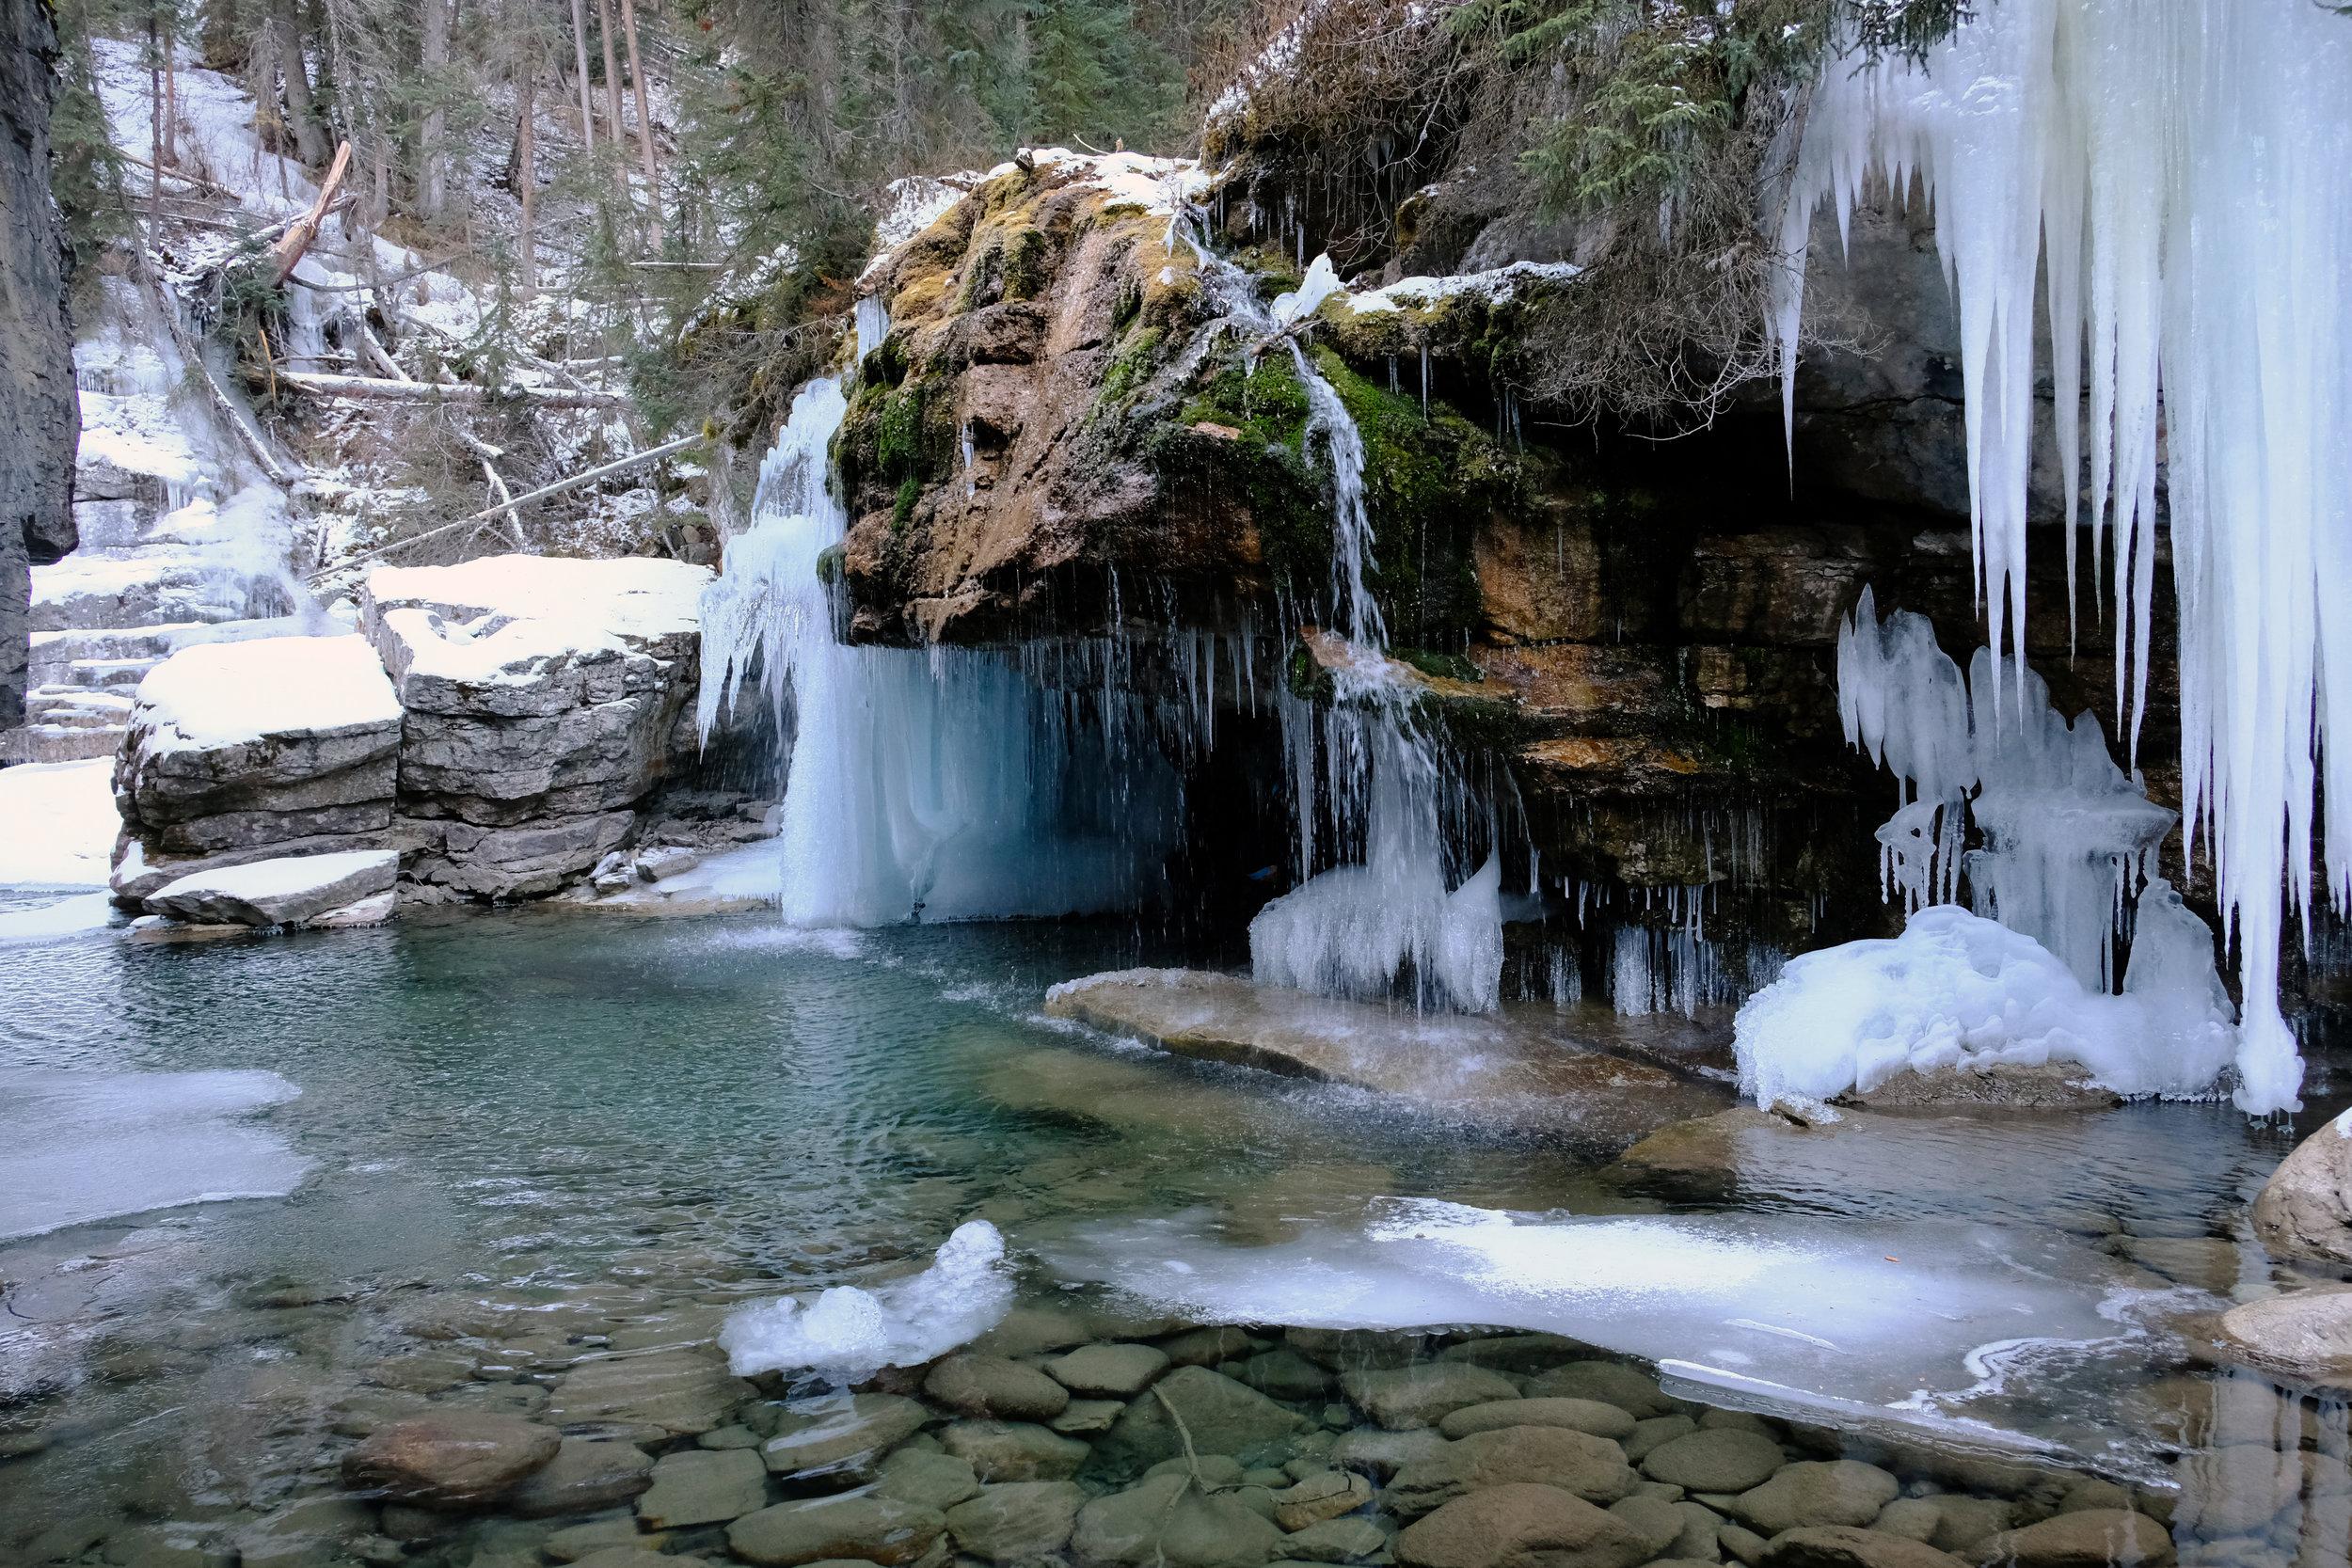 The Grotto - Early Season